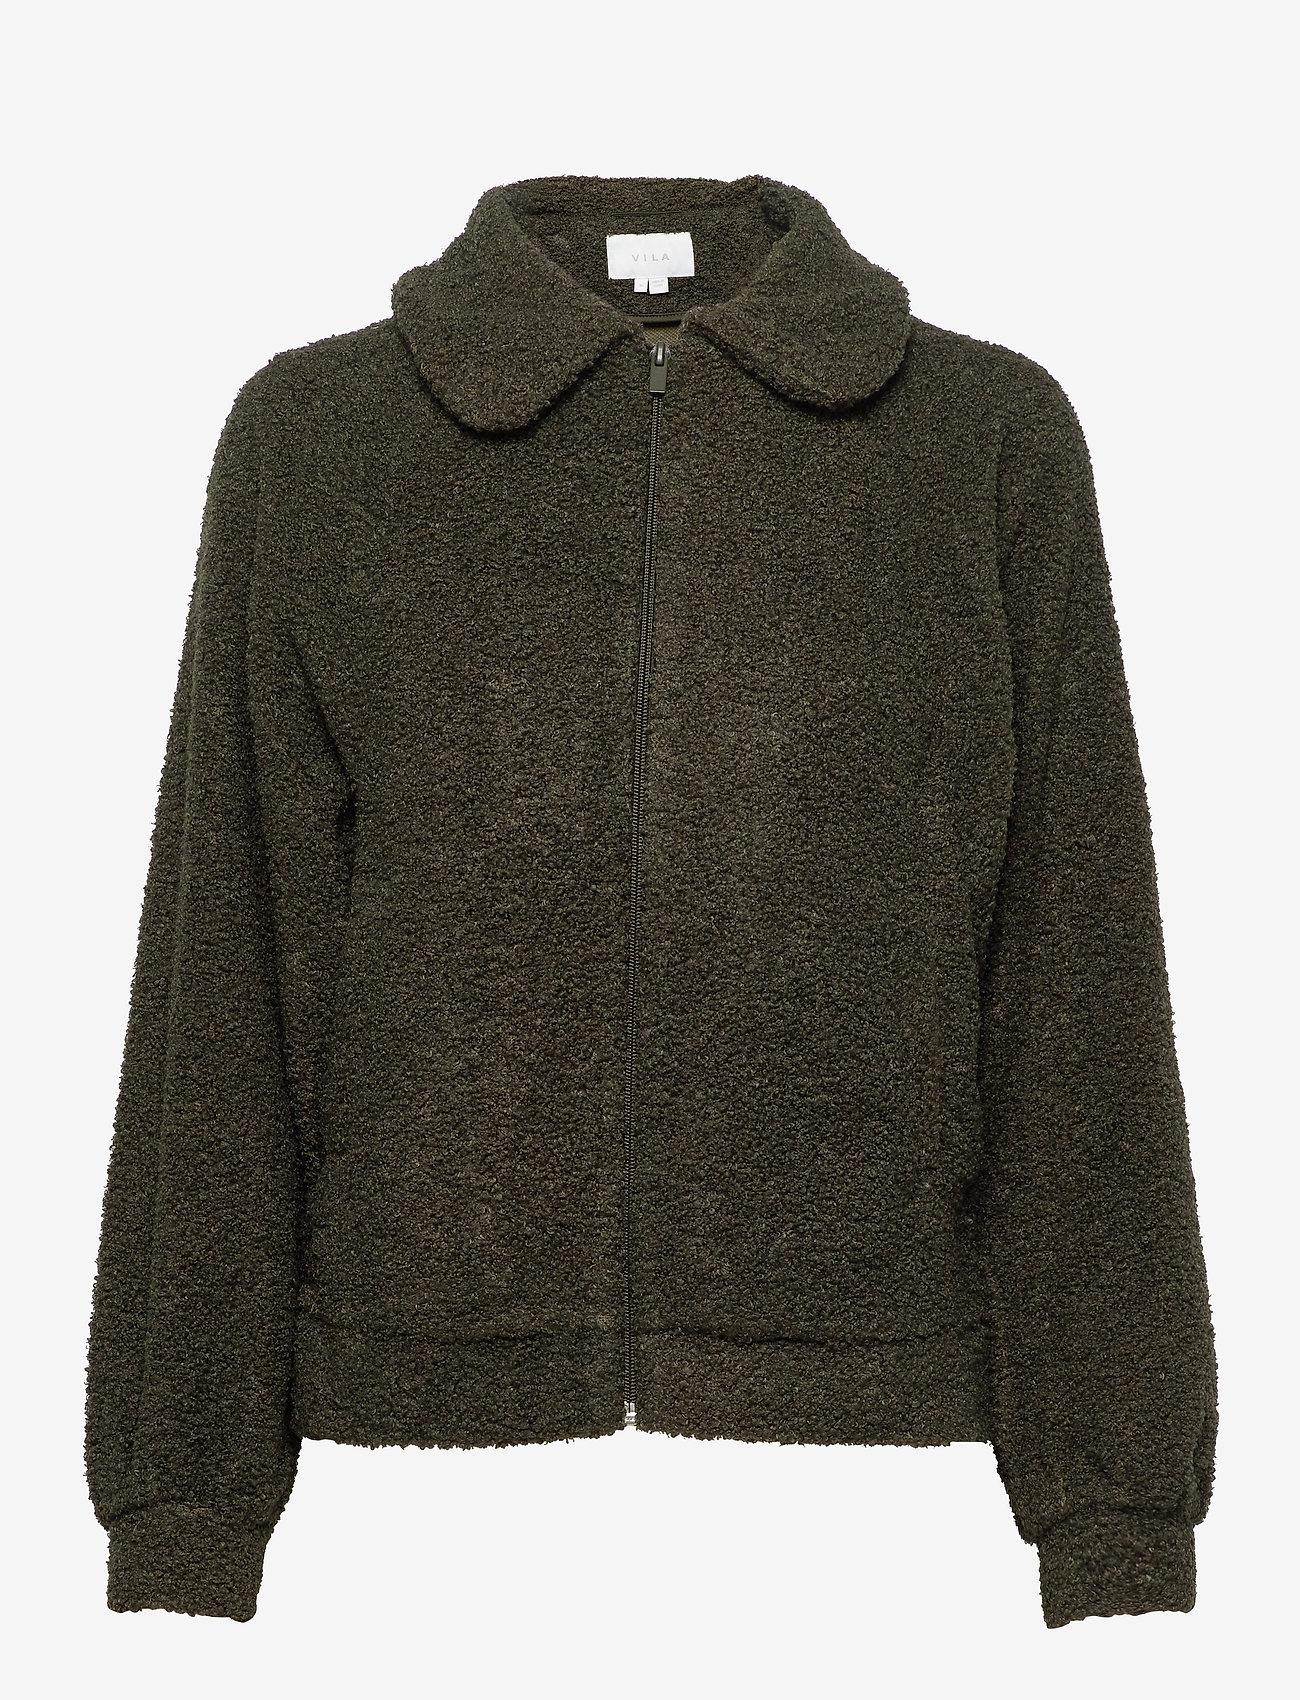 Vila - VIPIP BLOUSON/DES - wool jackets - forest night - 0